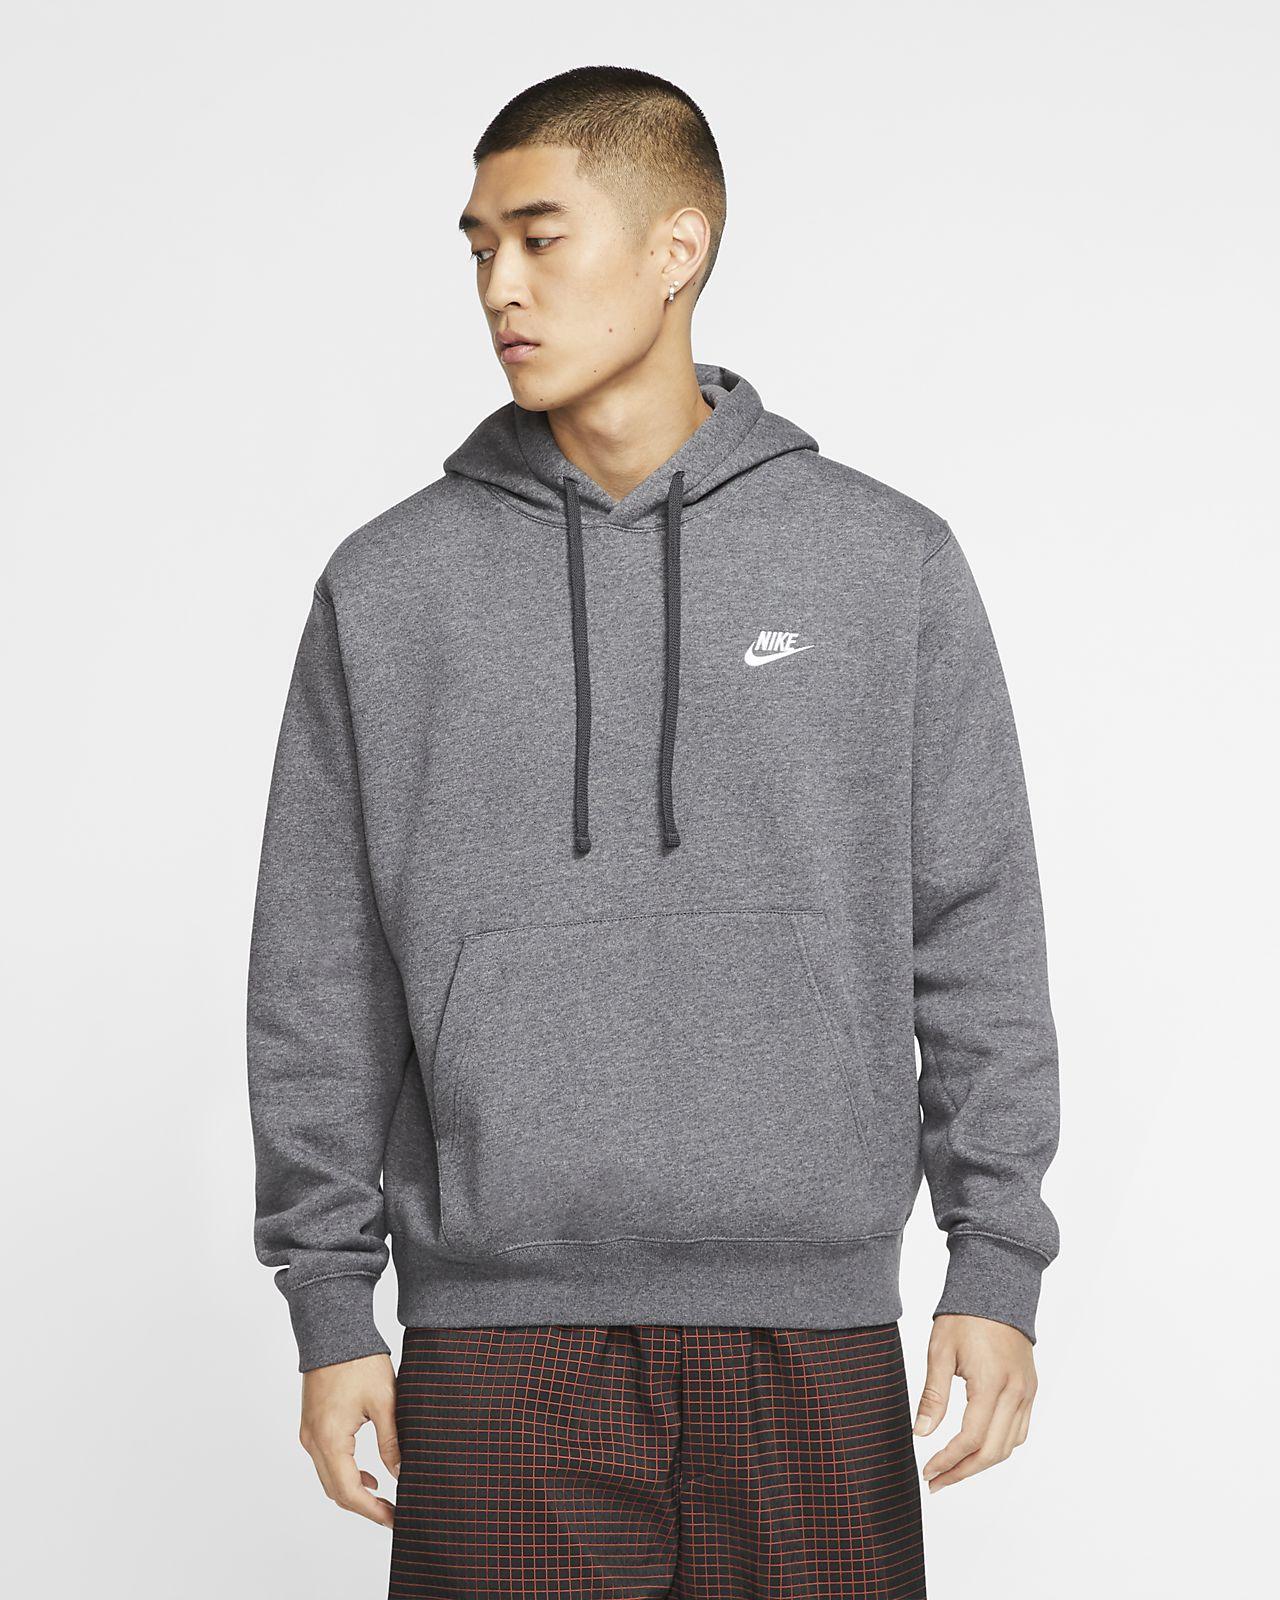 Nike Club Sweat Pants Charcoal HeatherAnthraciteWhite